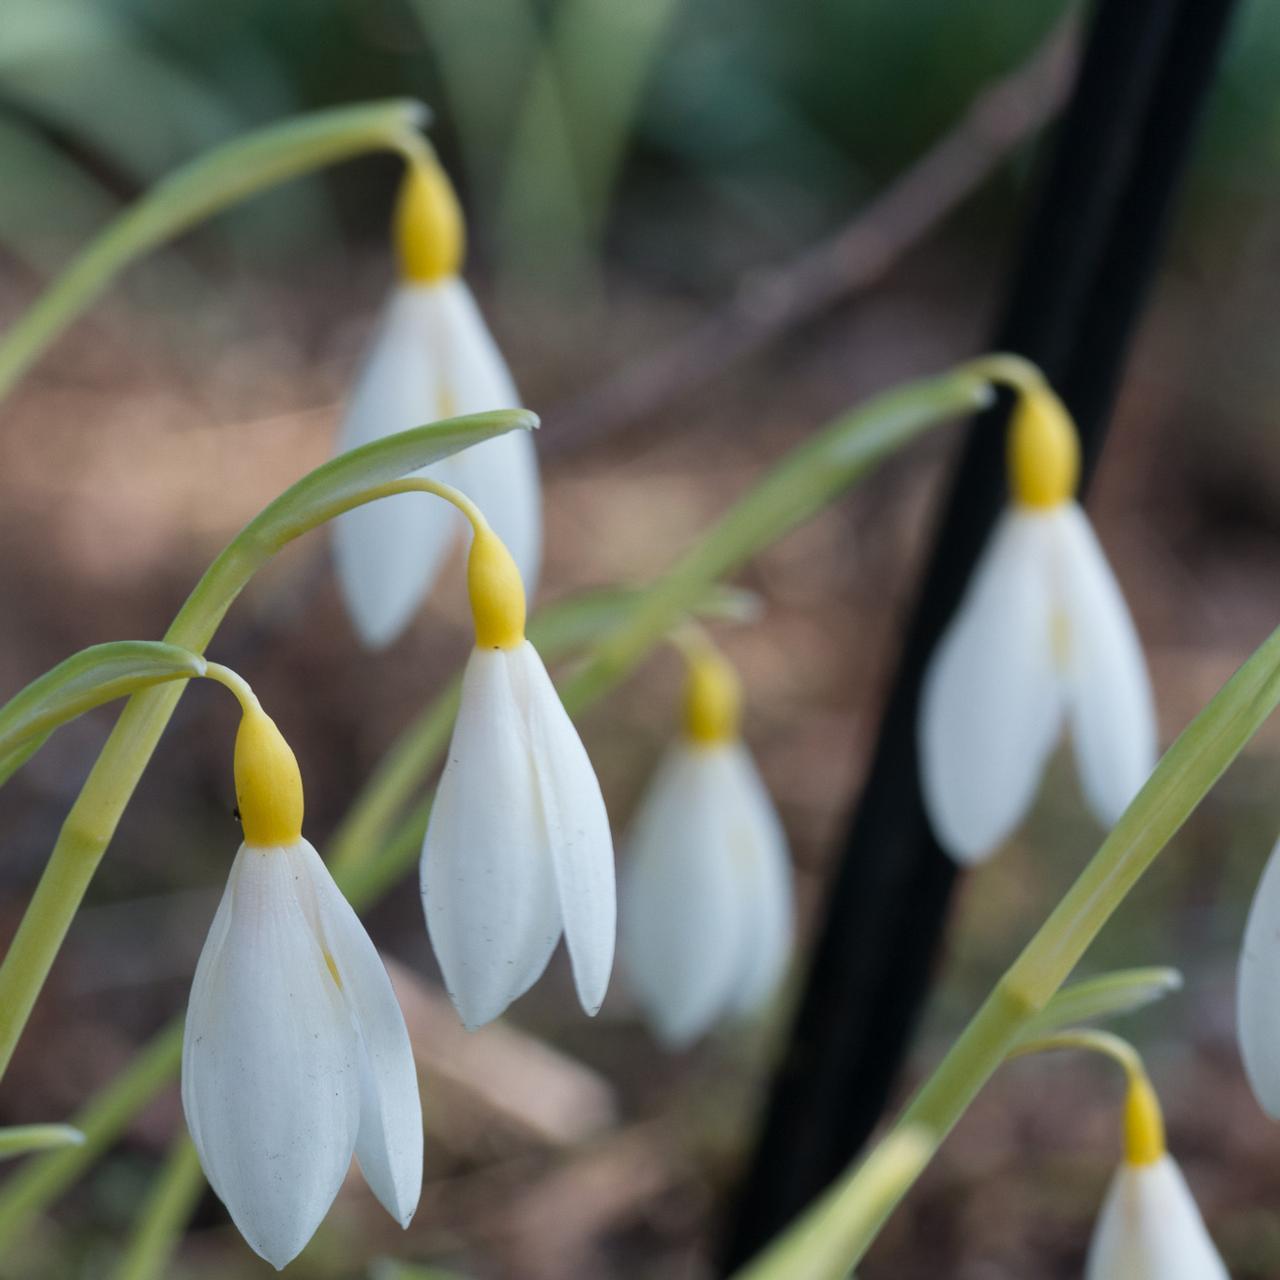 Galanthus plicatus 'Bill Clark' plant